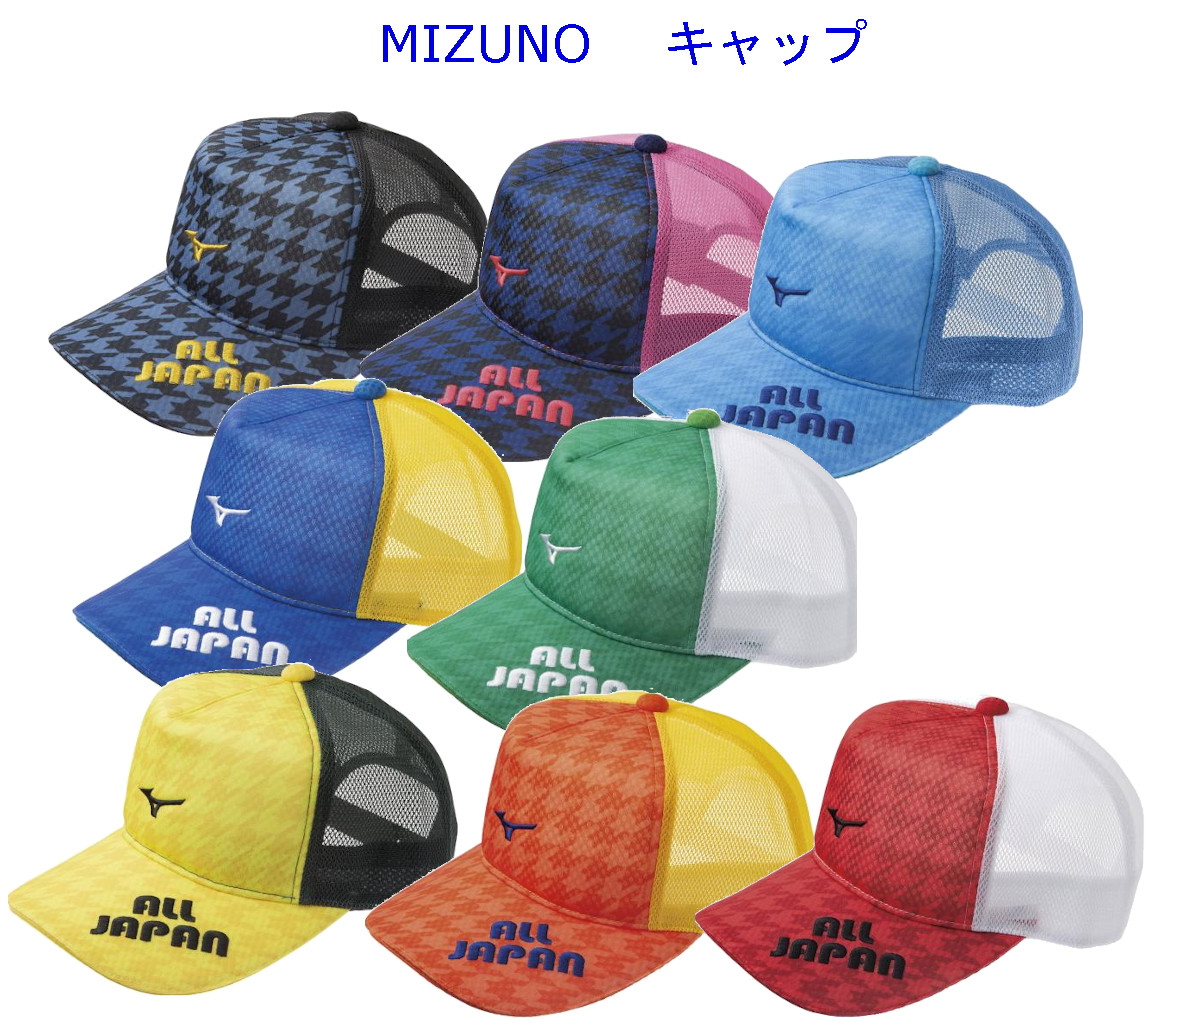 mizuno ALL JAPANソフトテニス テニス 帽子 男女兼用 限定品 UVケア ミズノ 2020限定キャップ 62JW0Z42 ユニセックス 2020SS ソフトテニス テニス